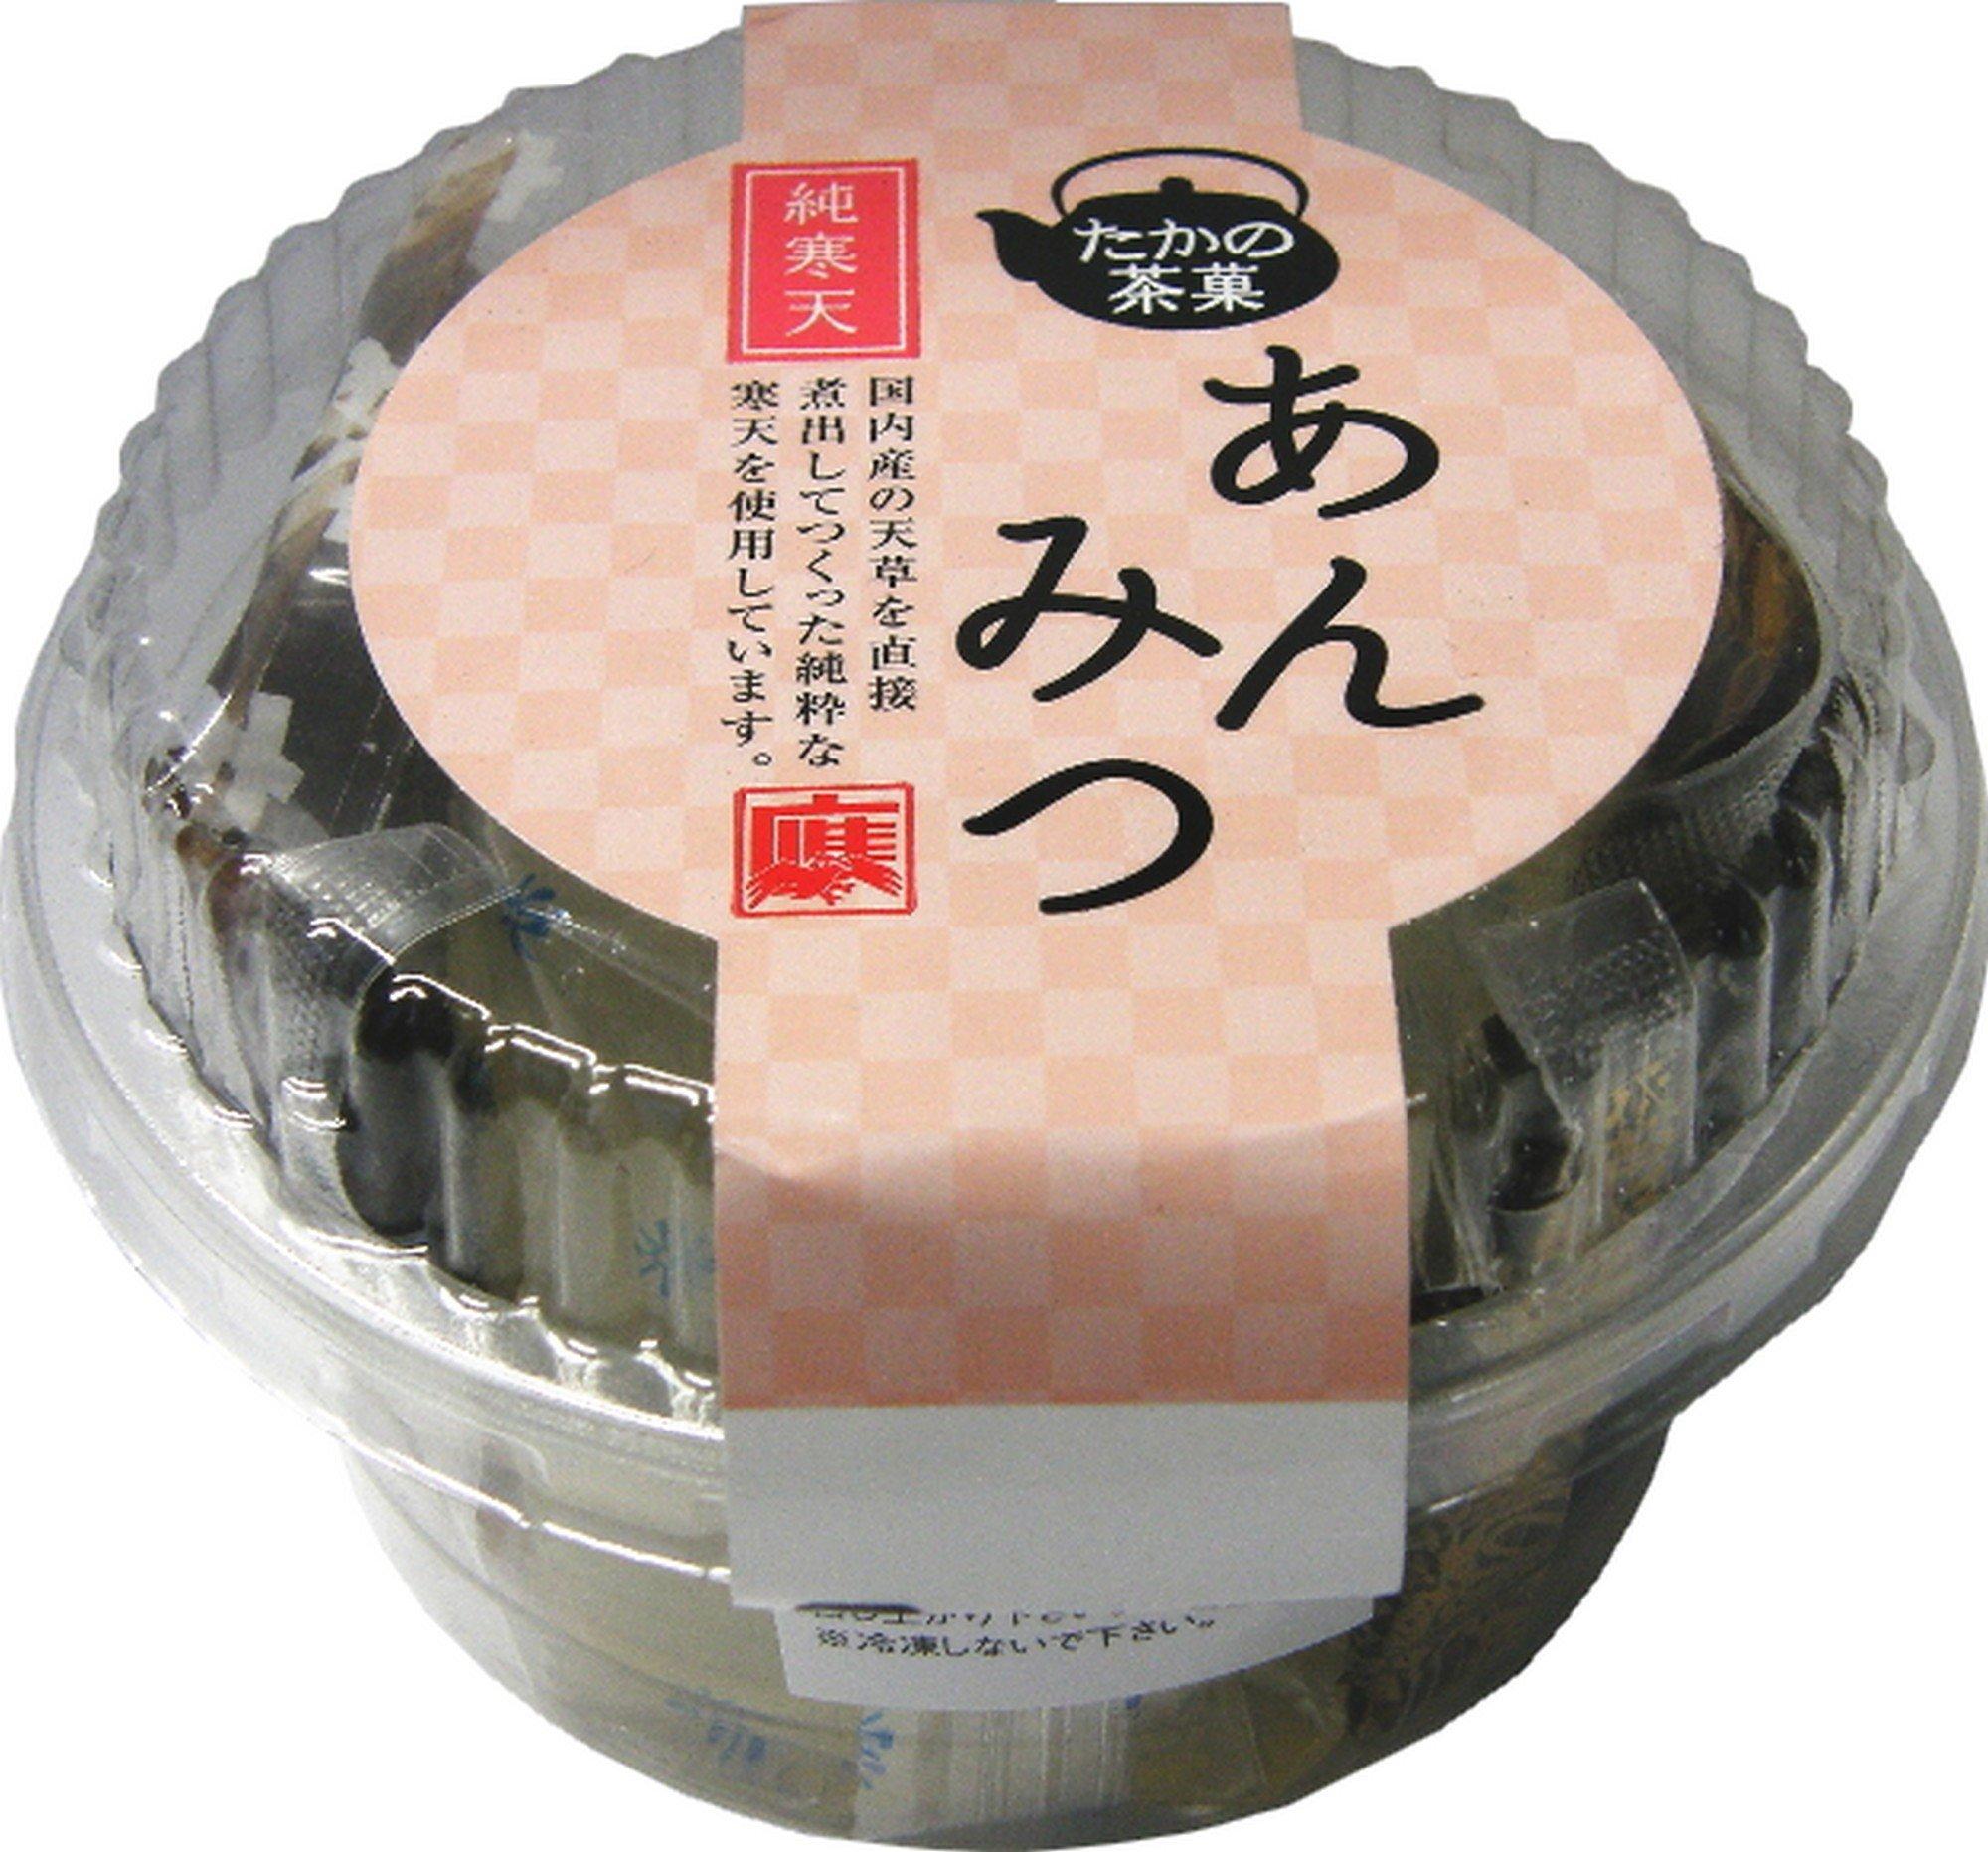 Takano refreshments pure agar Anmitsu 175gX8 pieces